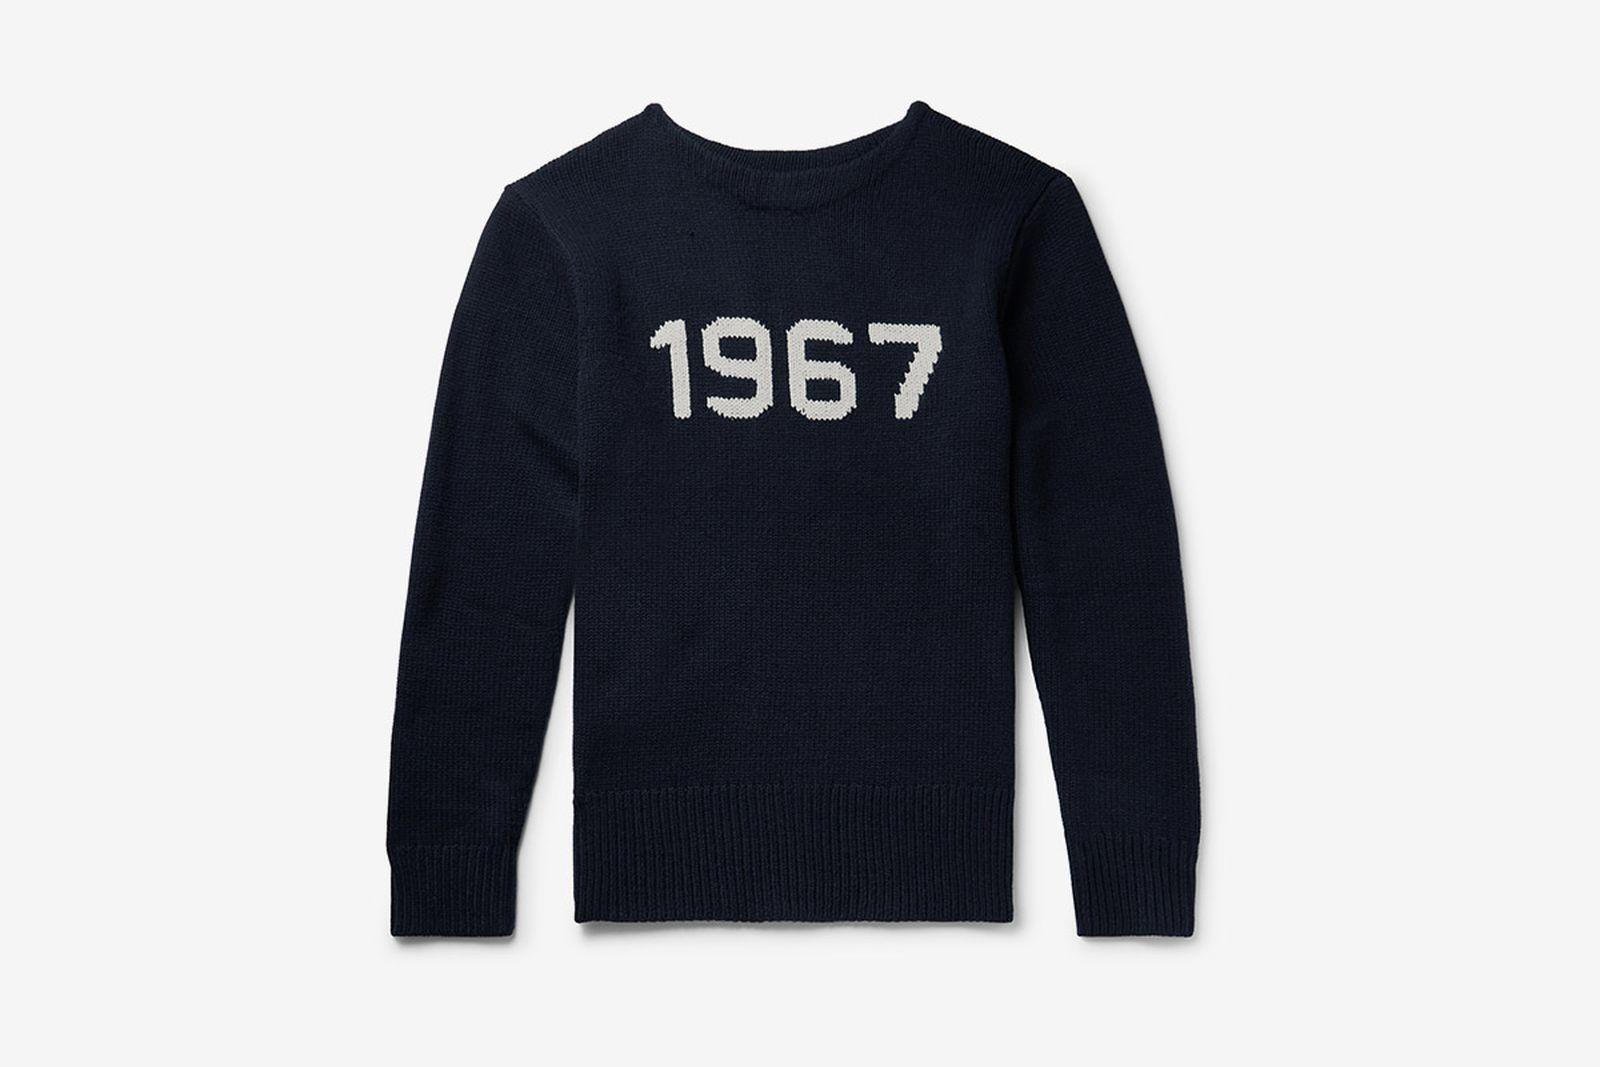 ralph lauren mr porter anniversary collection